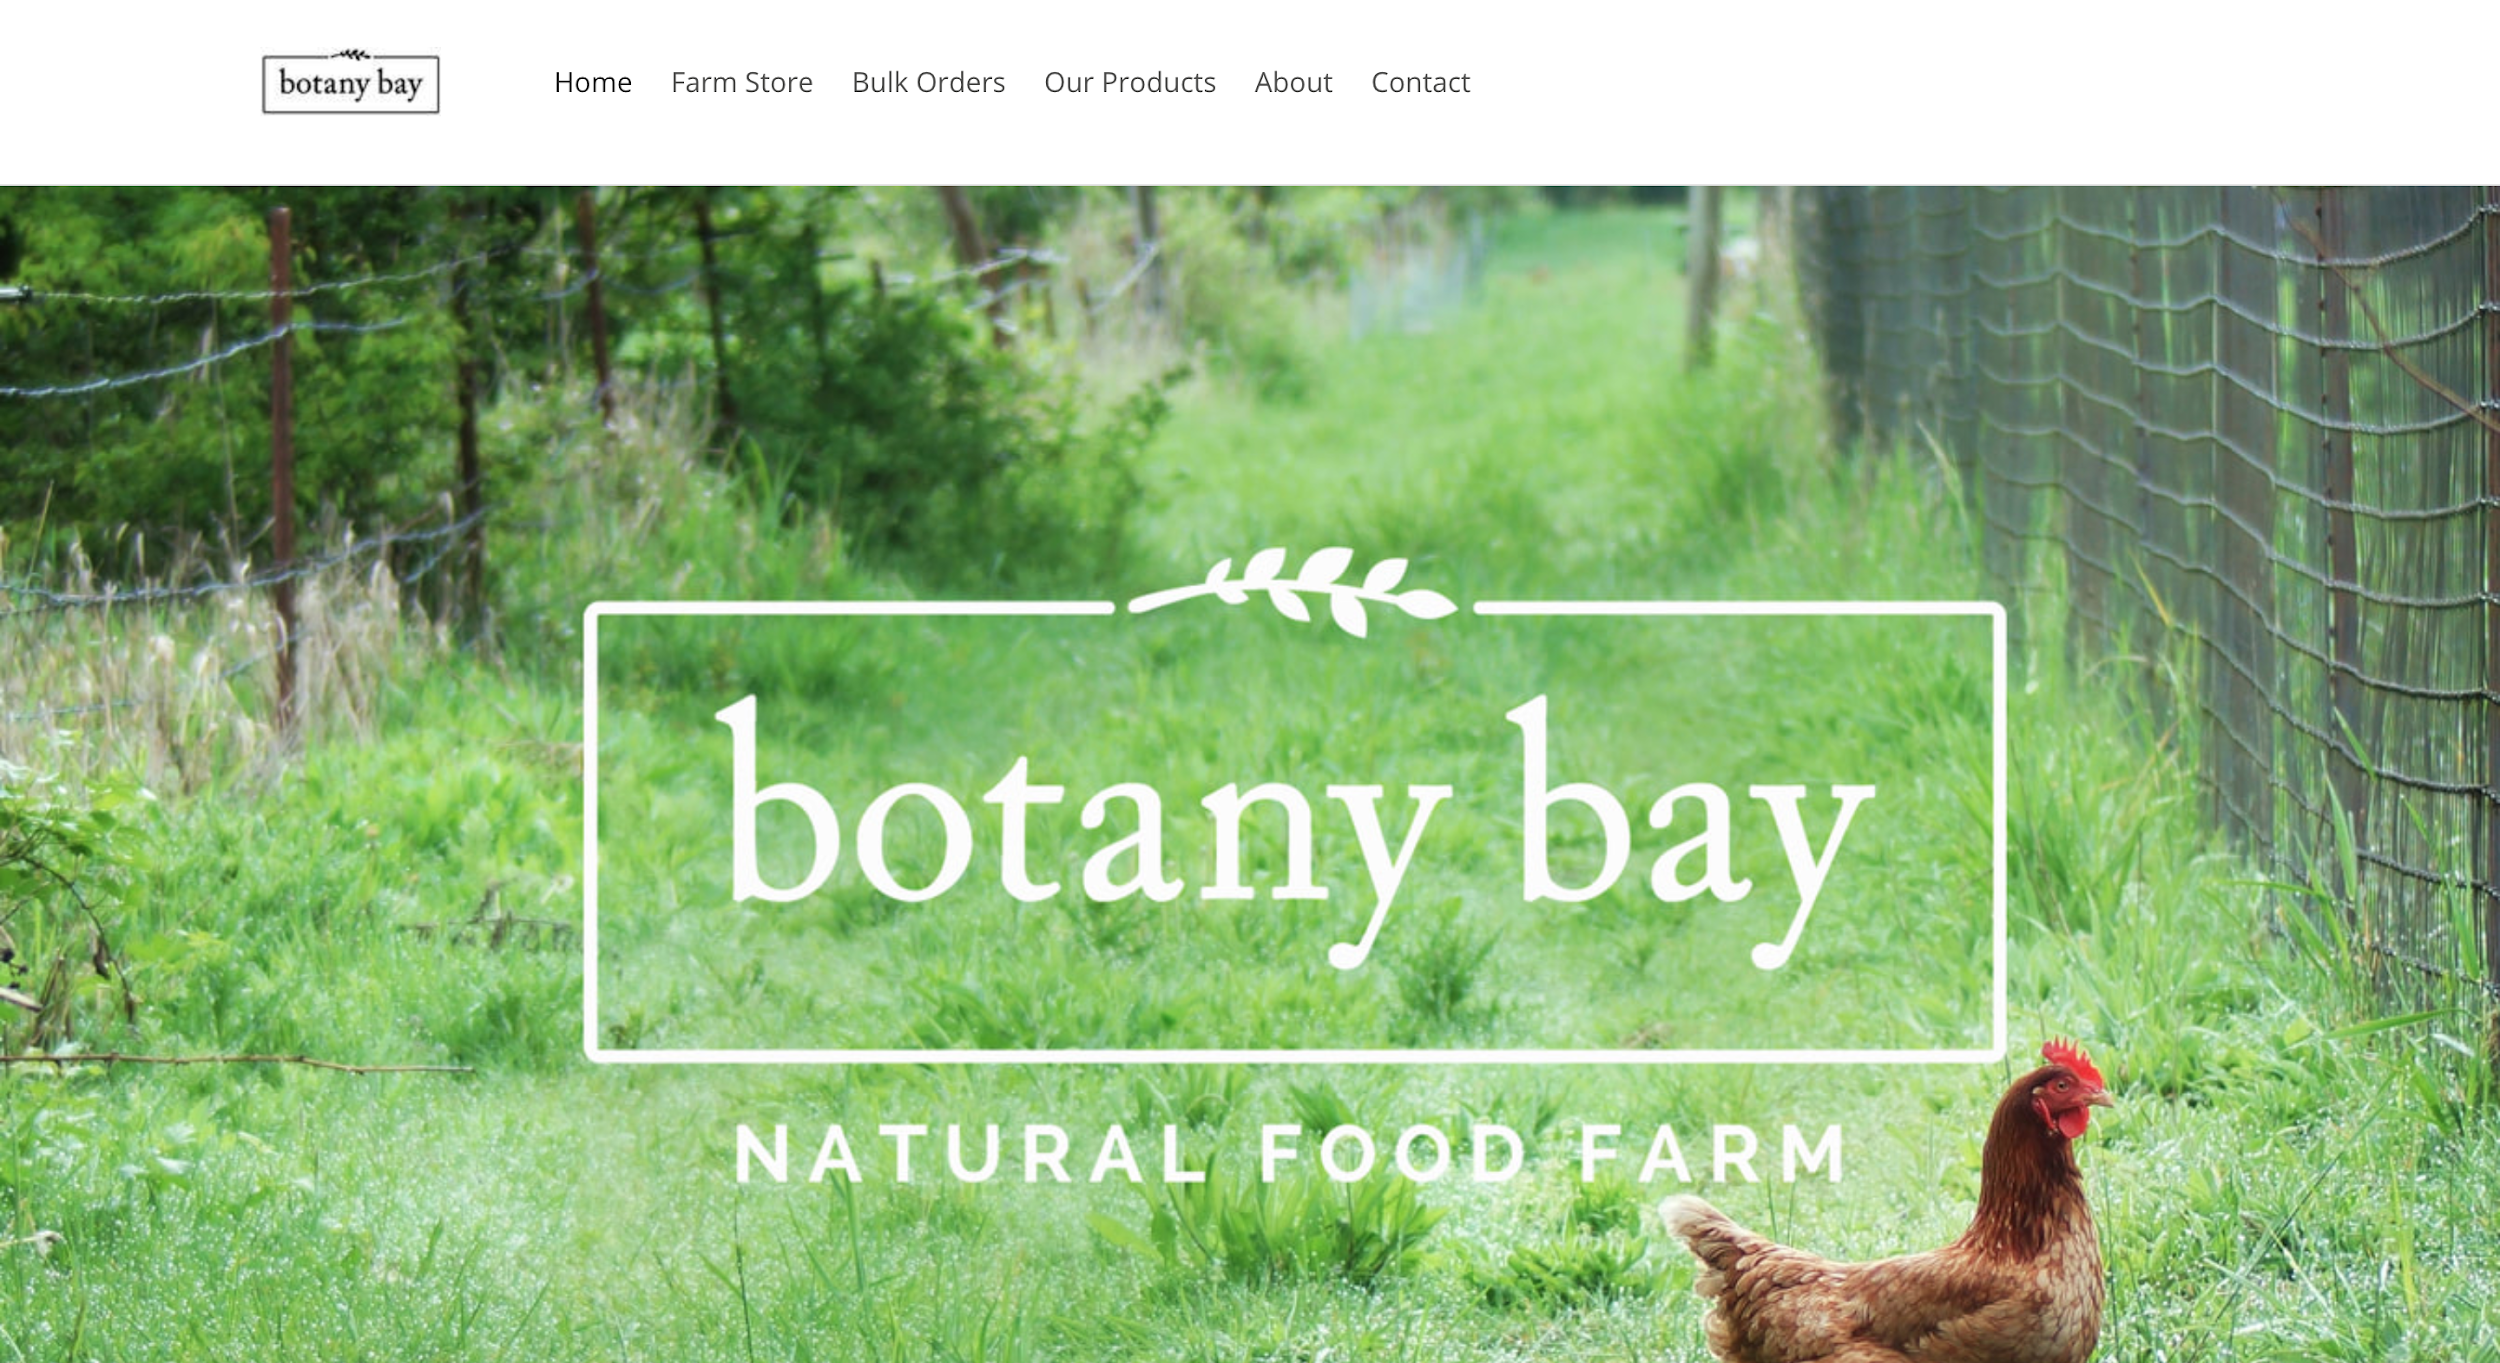 Botany Bay Farm website design